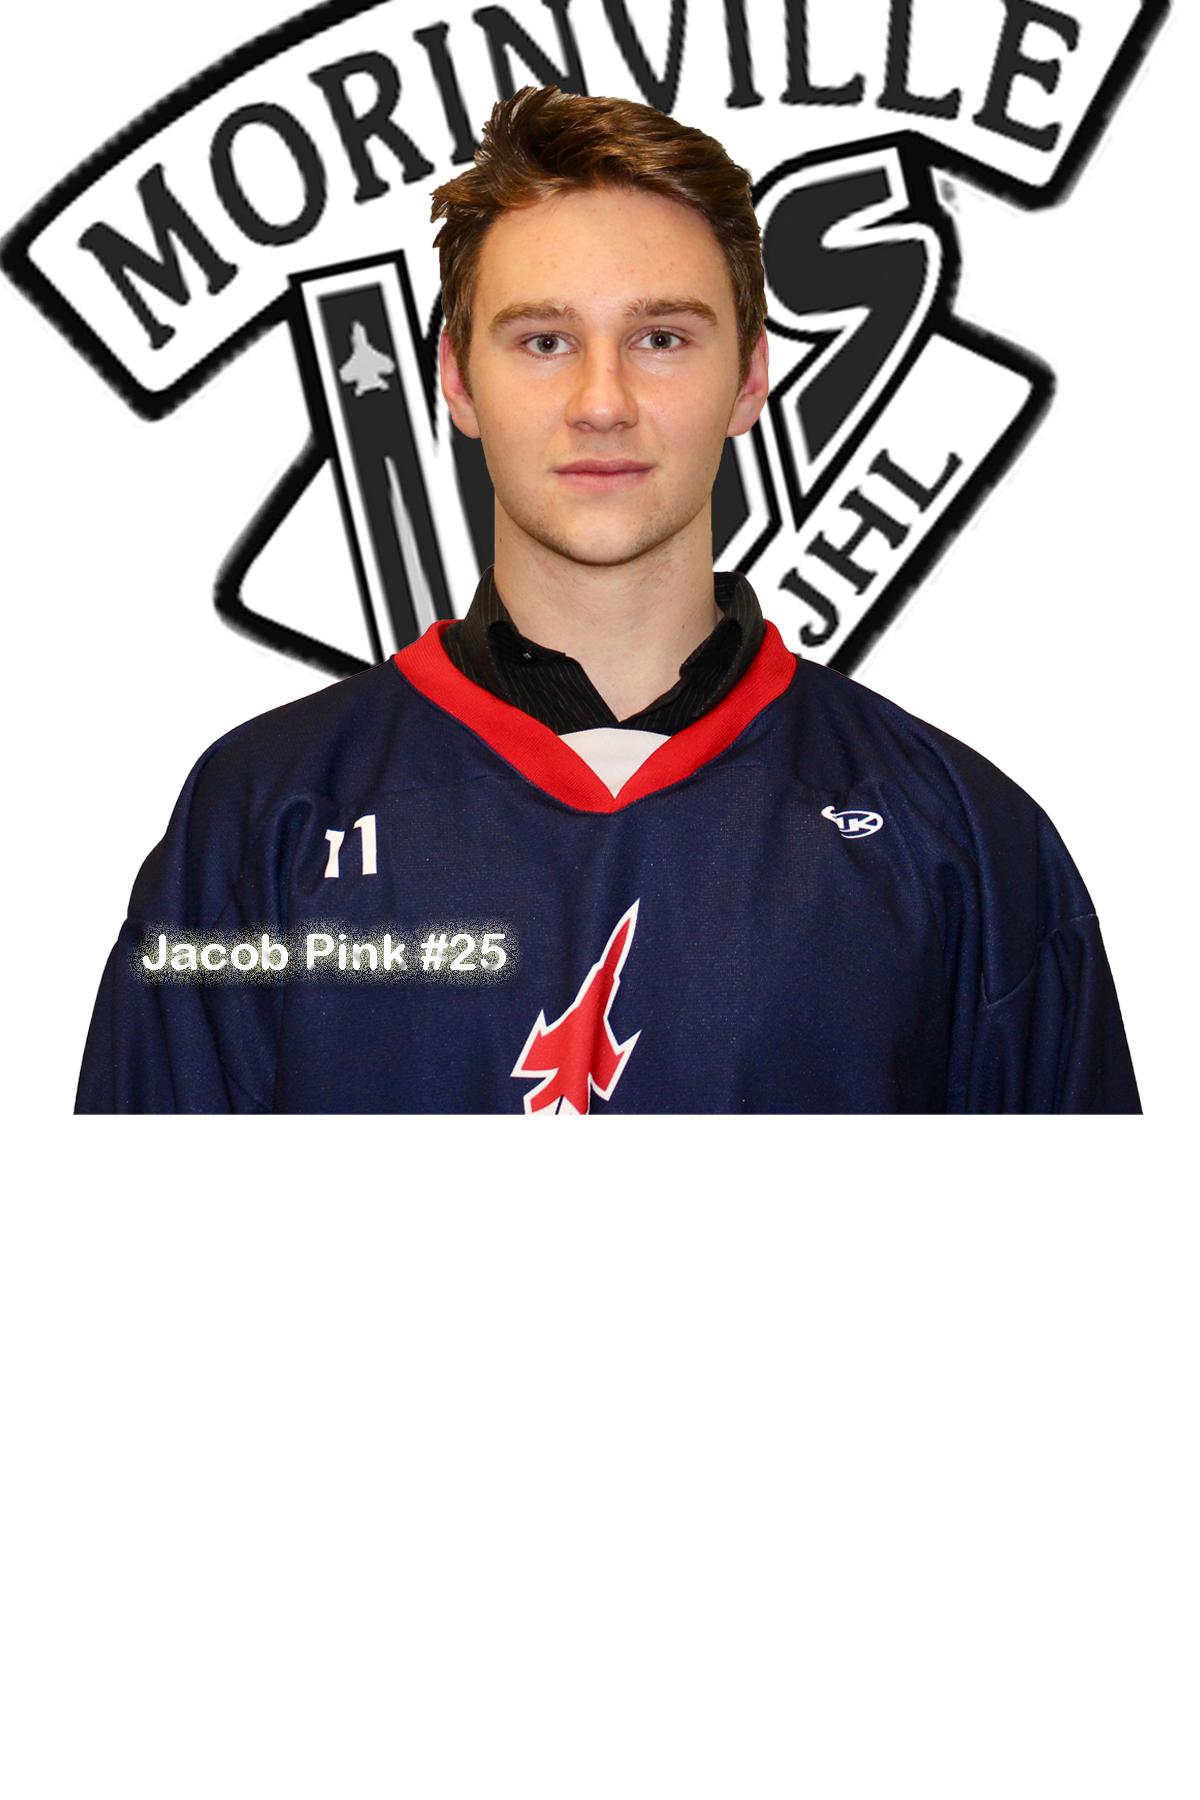 #25 Jacob Pink